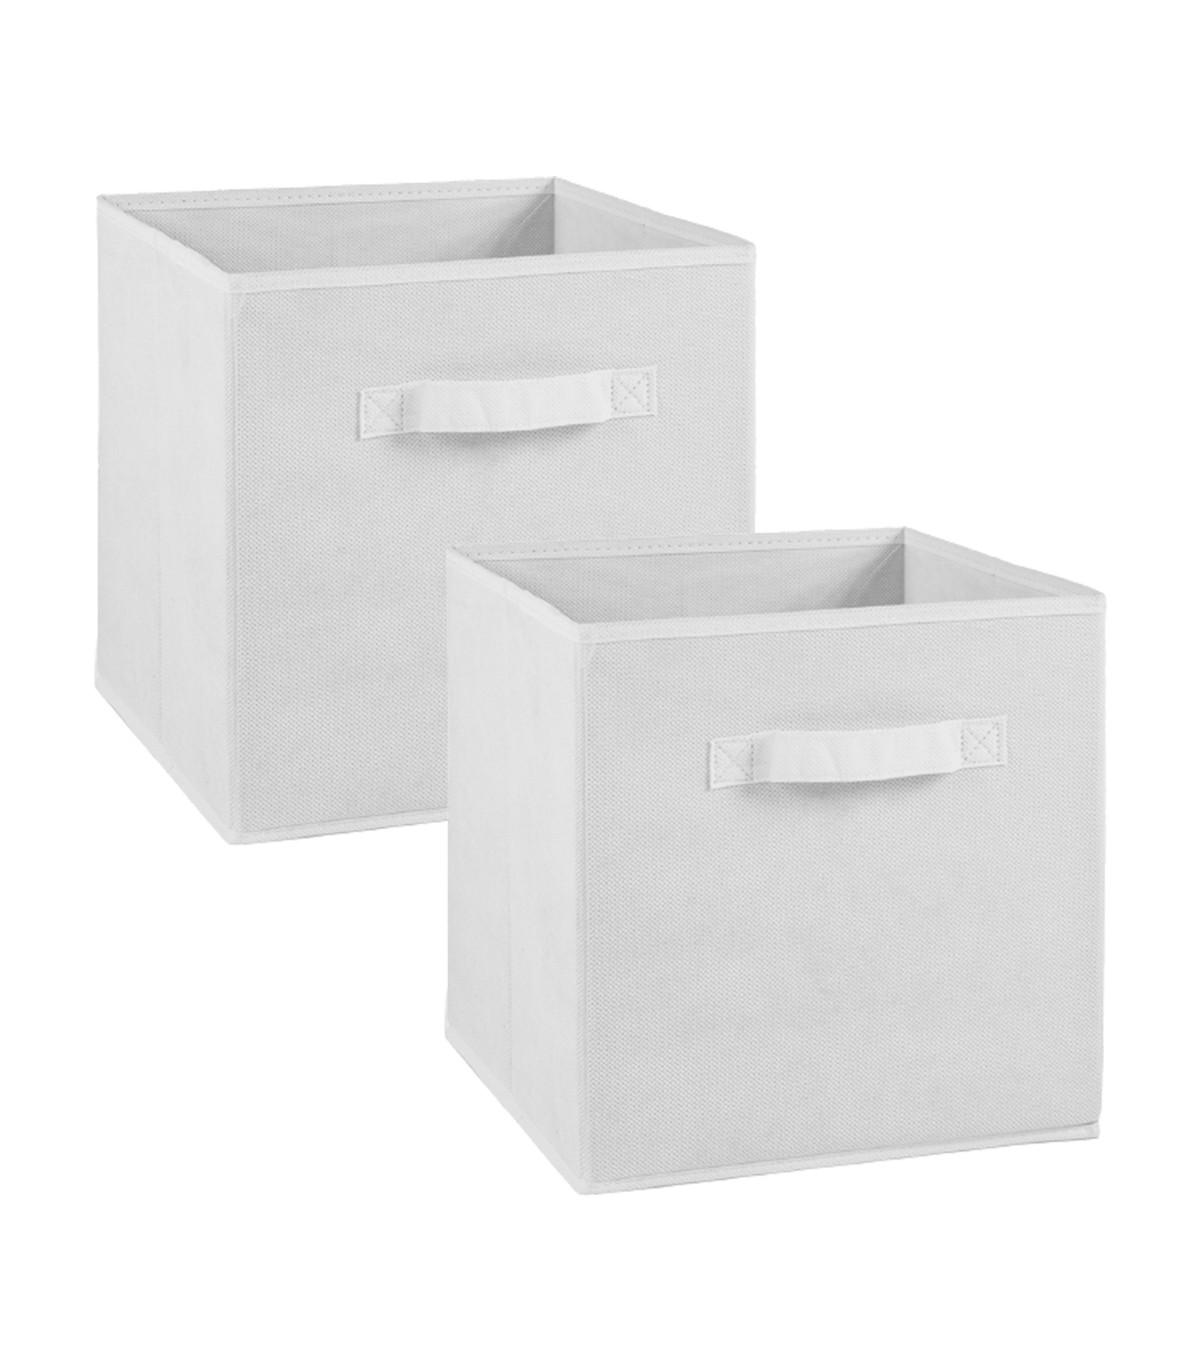 Lot de 2 cubes en intissé - 28x28x27cm - Blanc